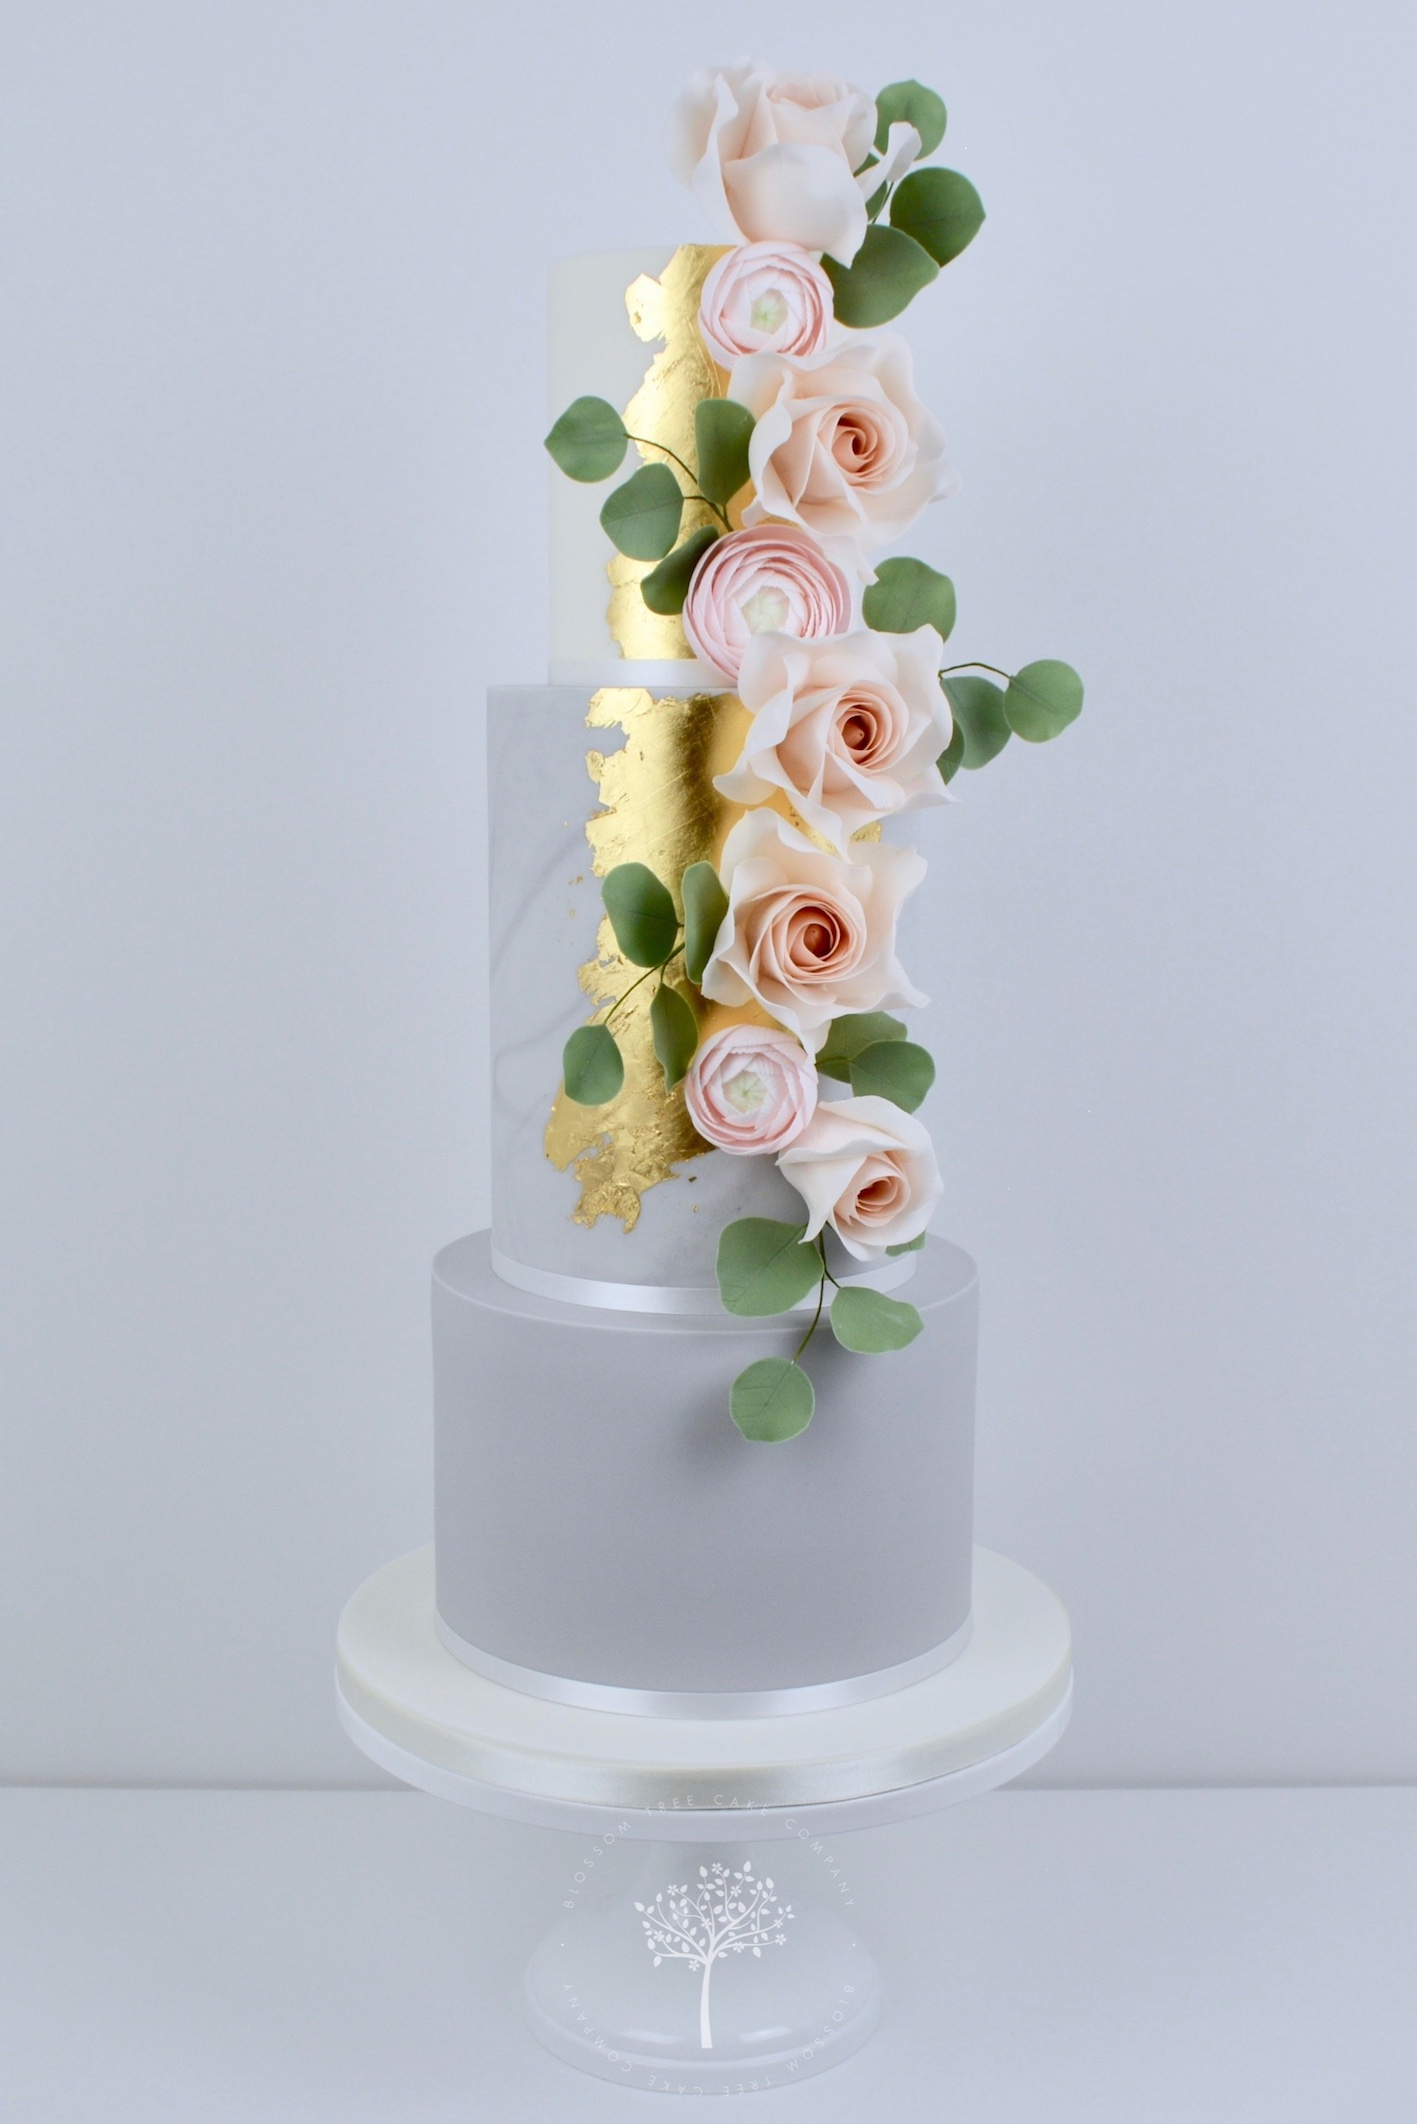 Rose Gold and Ranunculus wedding cake by Blossom Tree Cake Company Harrogate North Yorkshire.jpg